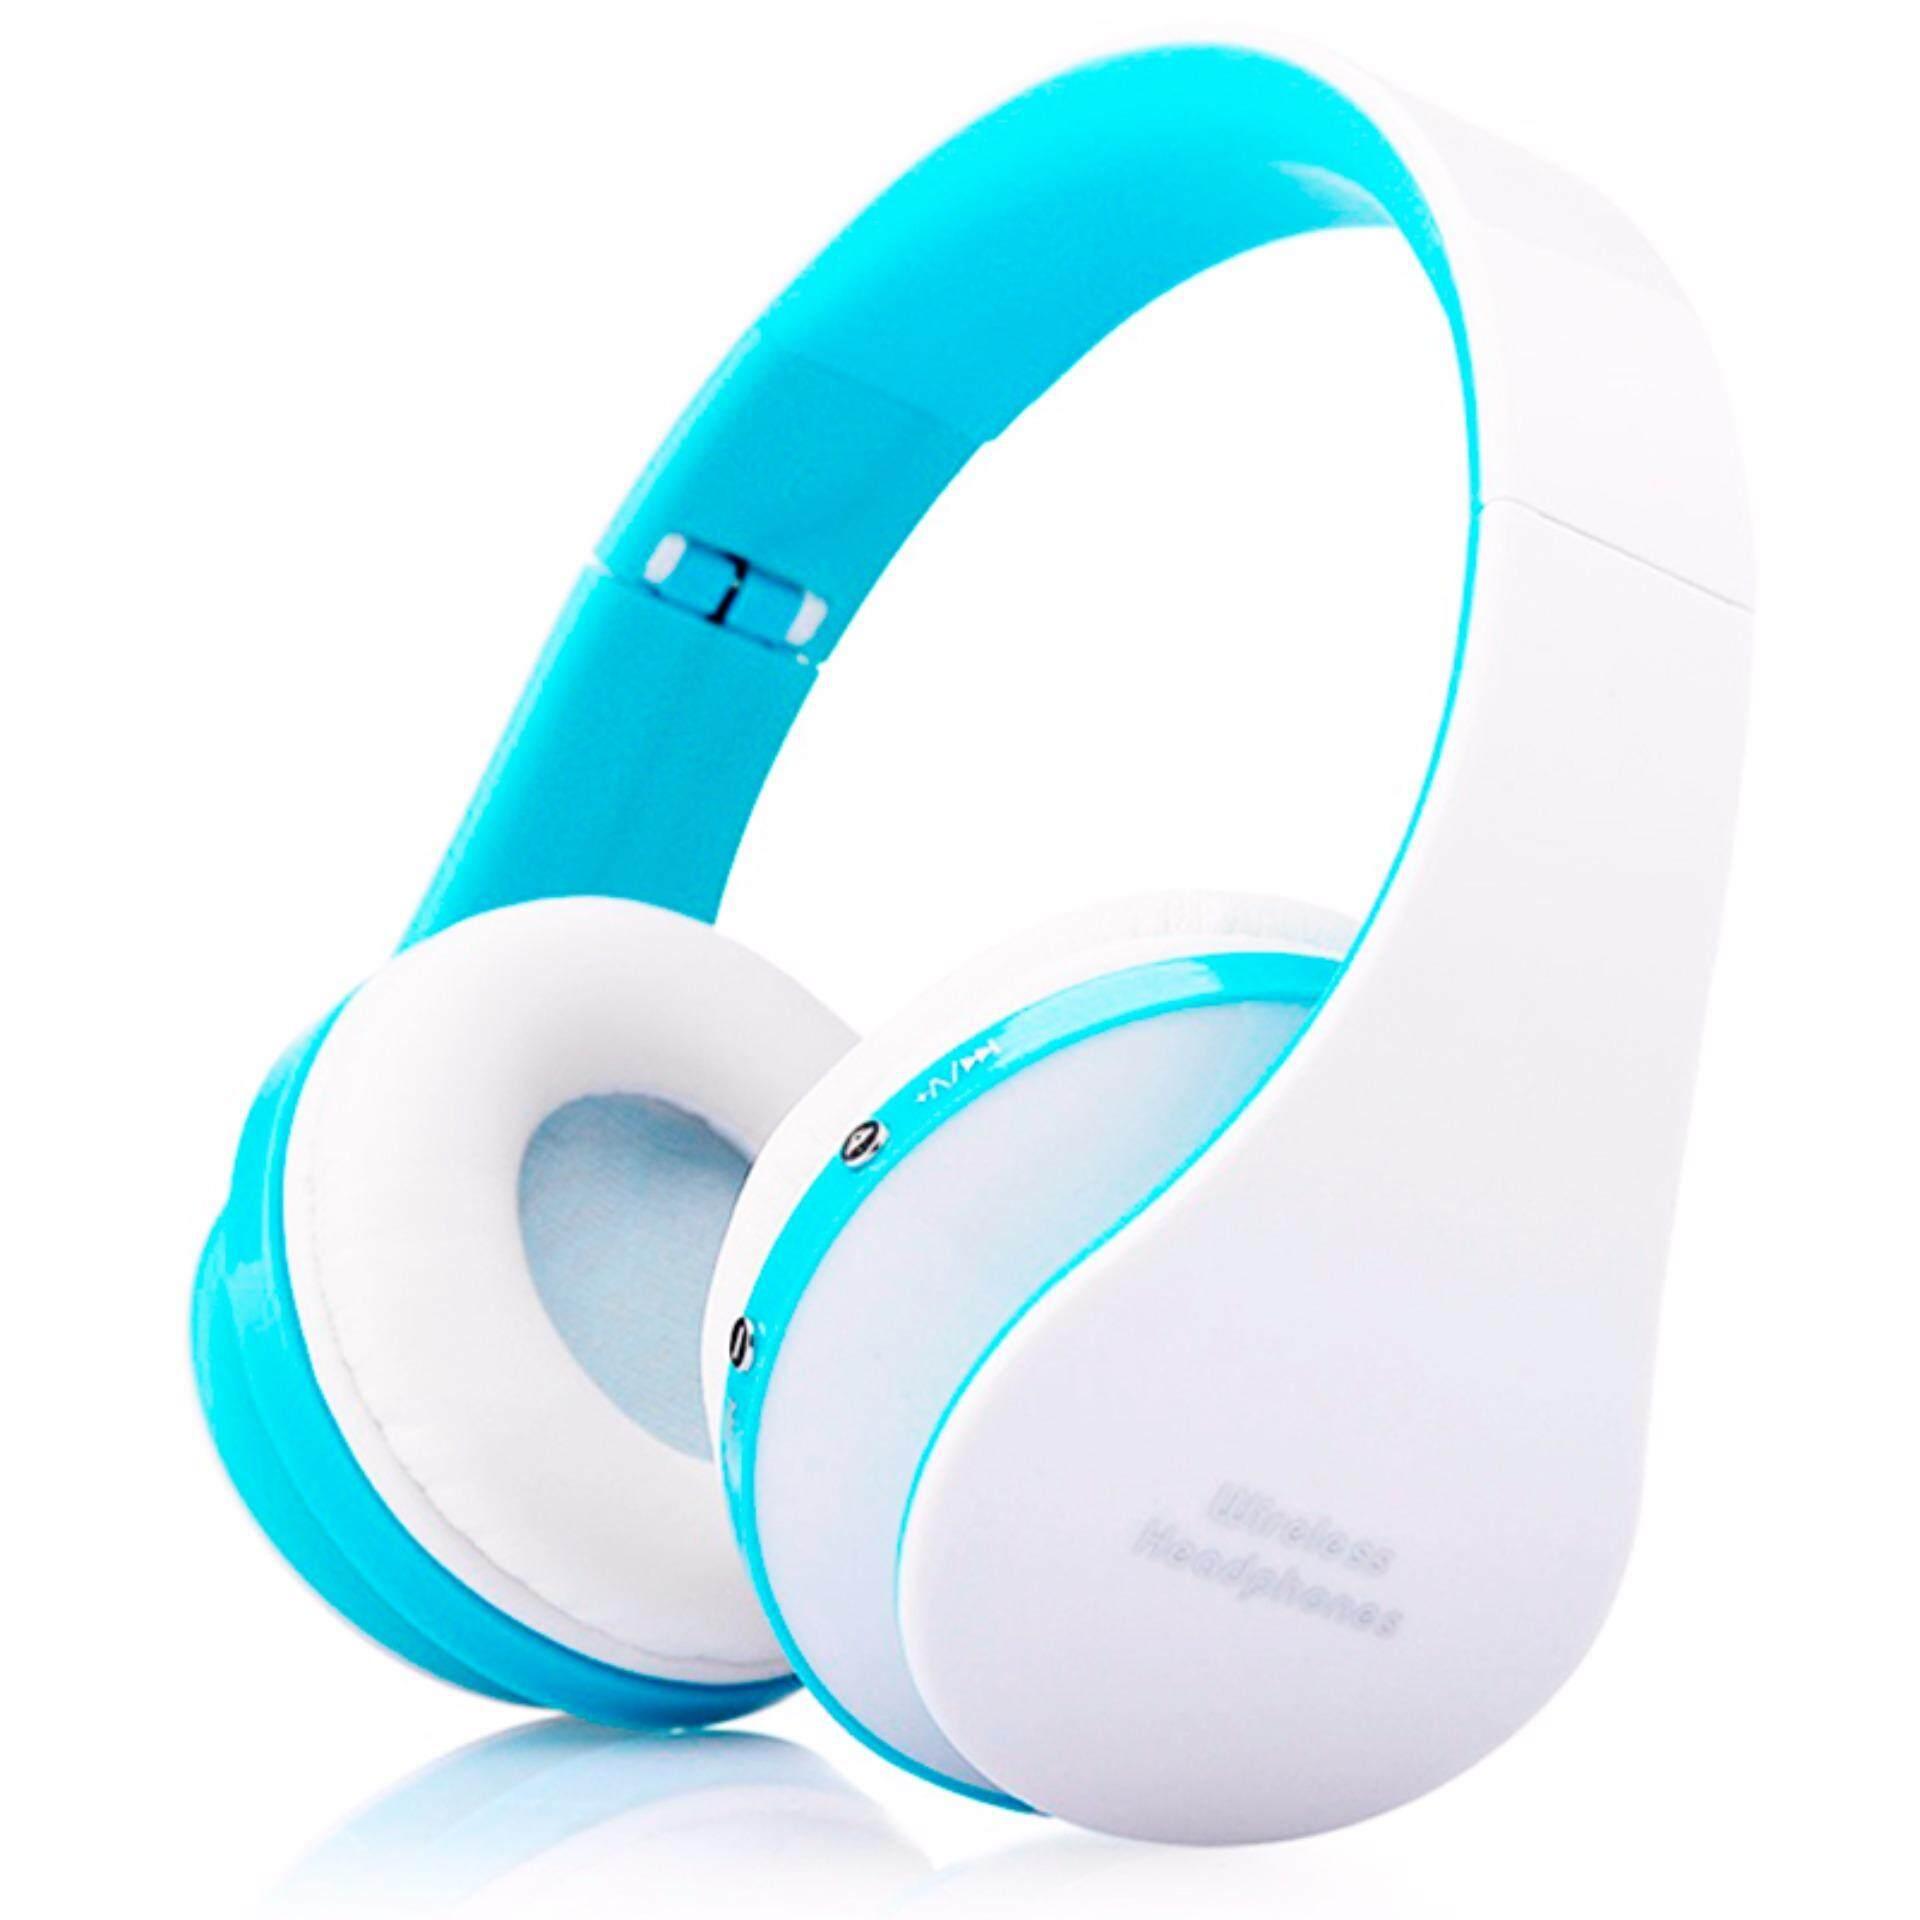 IUNYK NX-8252 Professional Foldable Wireless Bluetooth Headphone Super Stereo Bass Effect Portable Headset IP0022